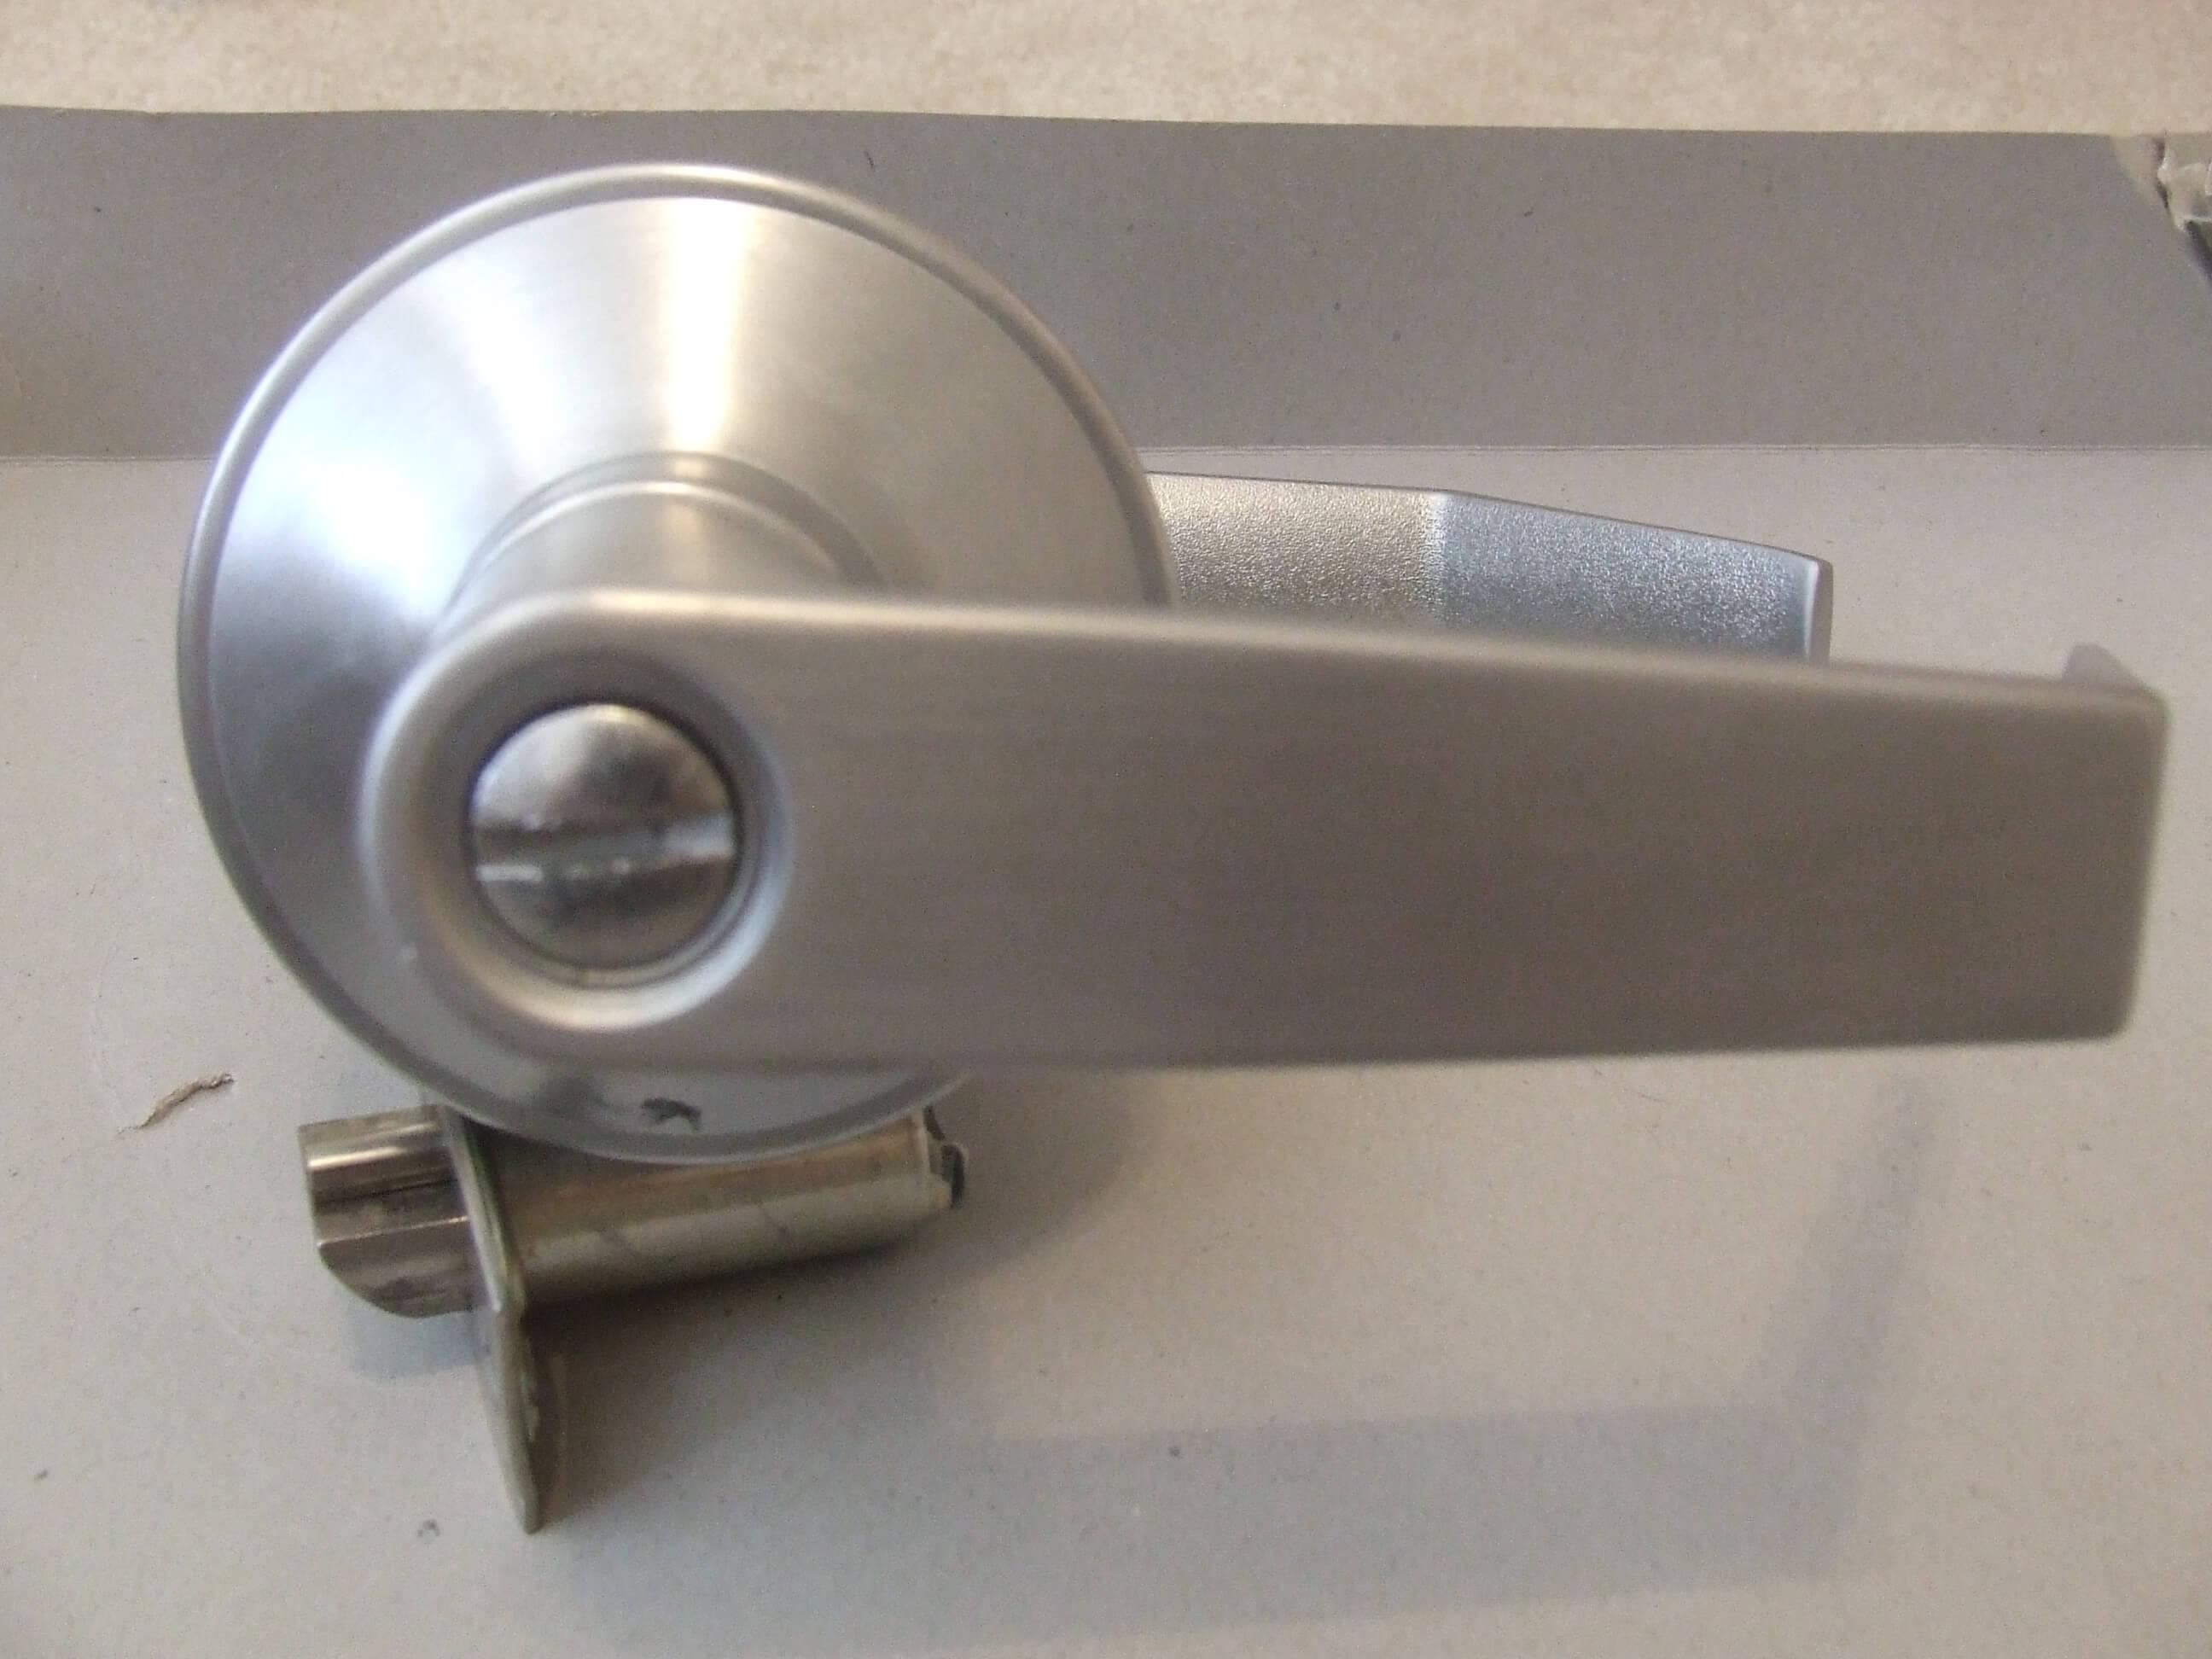 Commercial Bathroom Door Locks Decoration Image Ideas - Commercial bathroom door handle